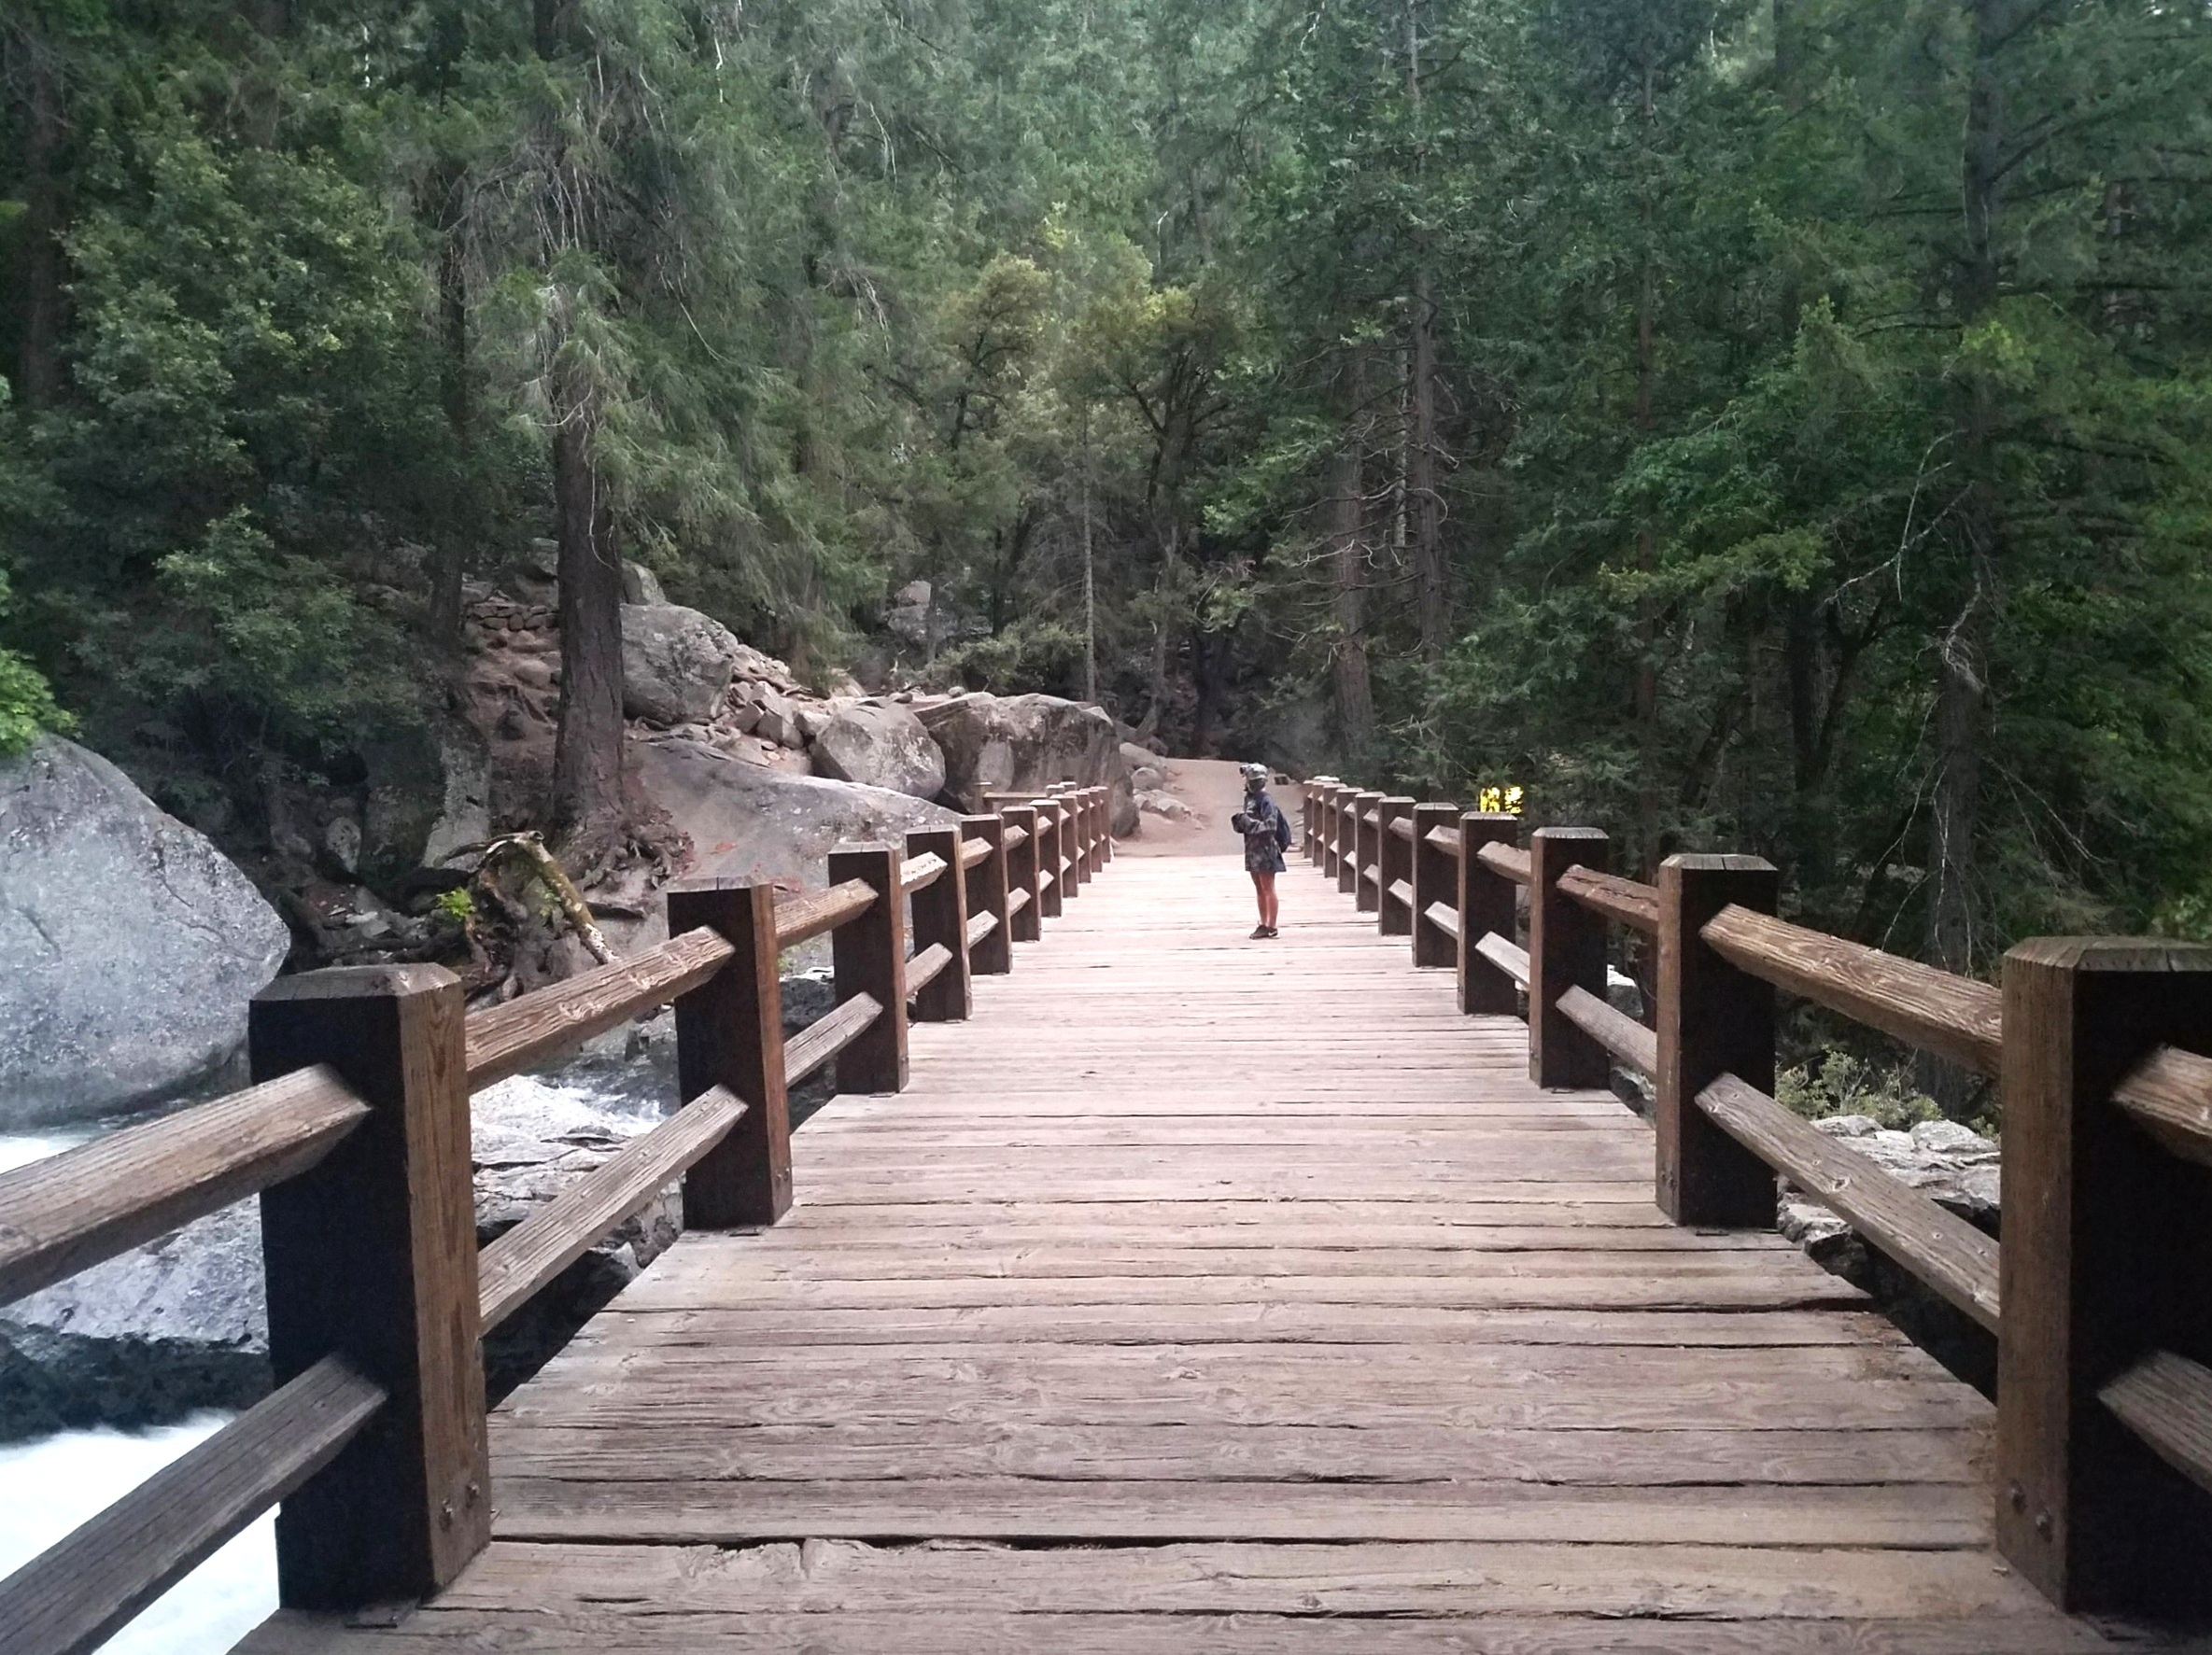 Hiking the Mist Trail - Yosemite National Park